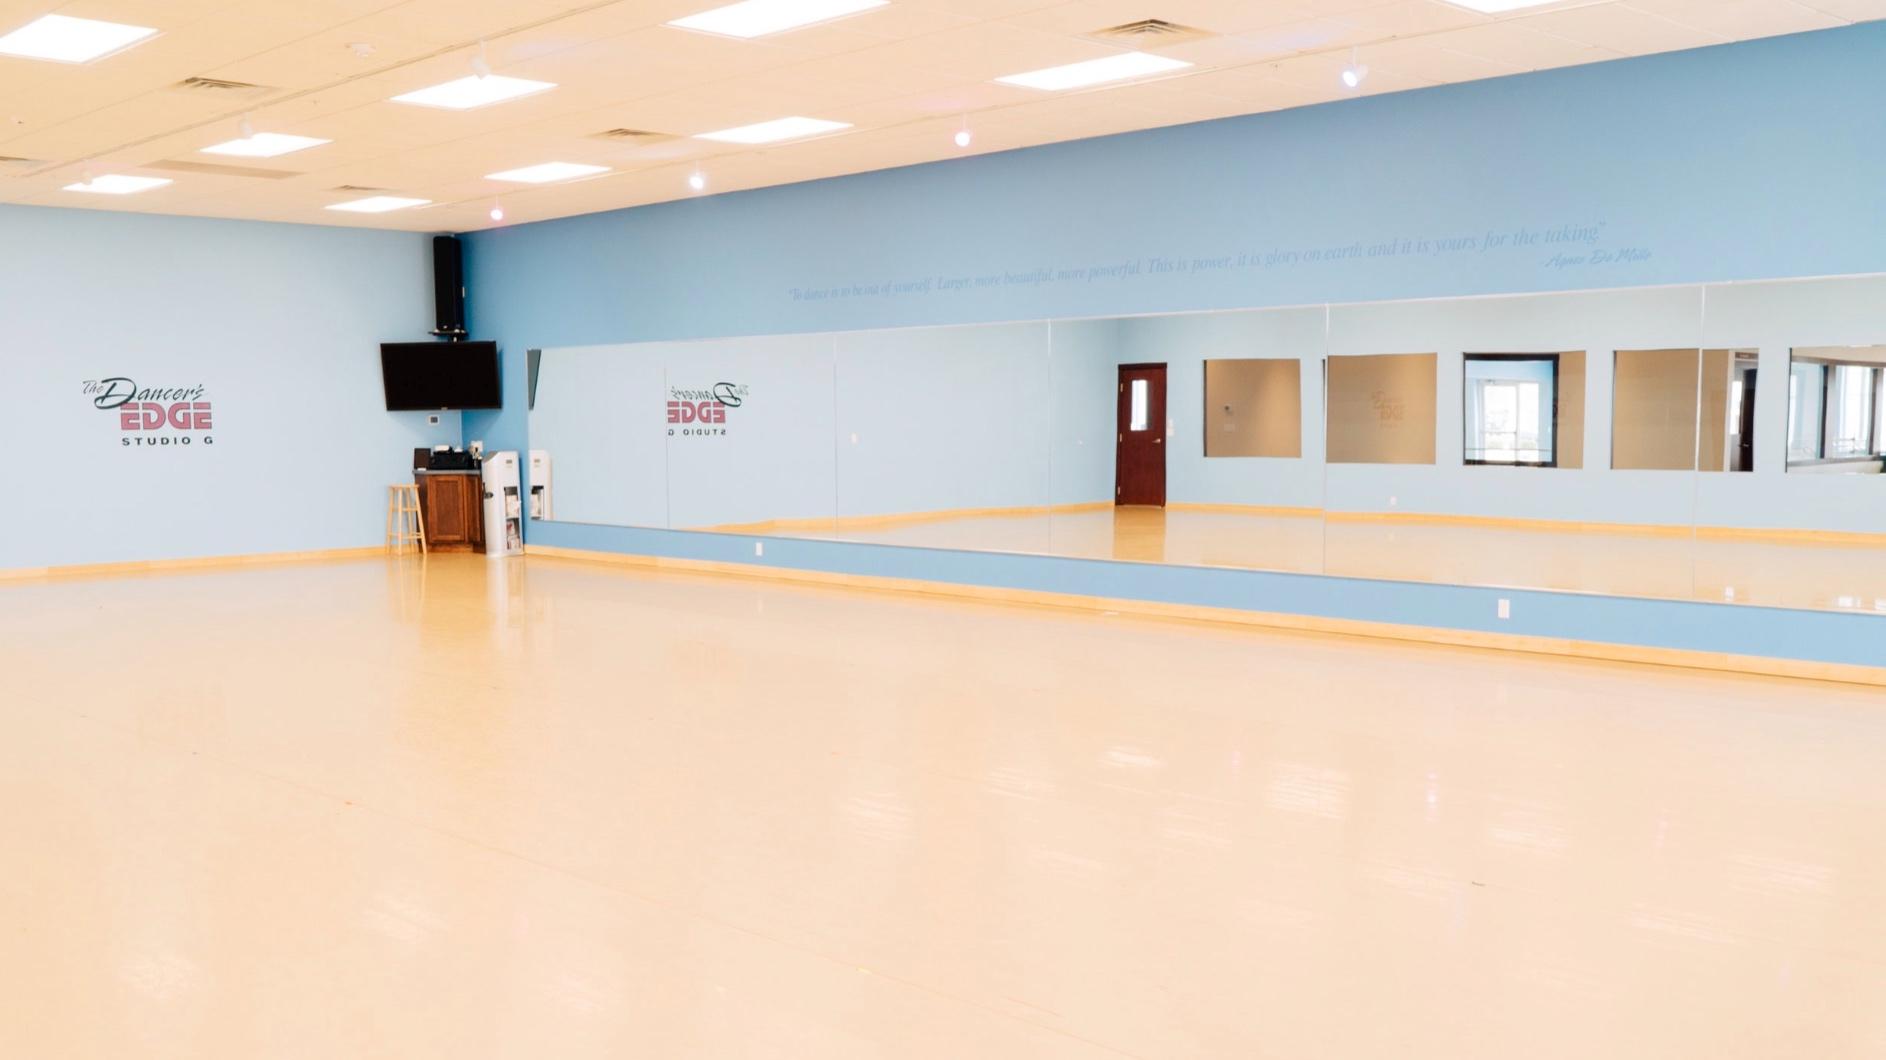 The Dancer's EDGE Studio Room